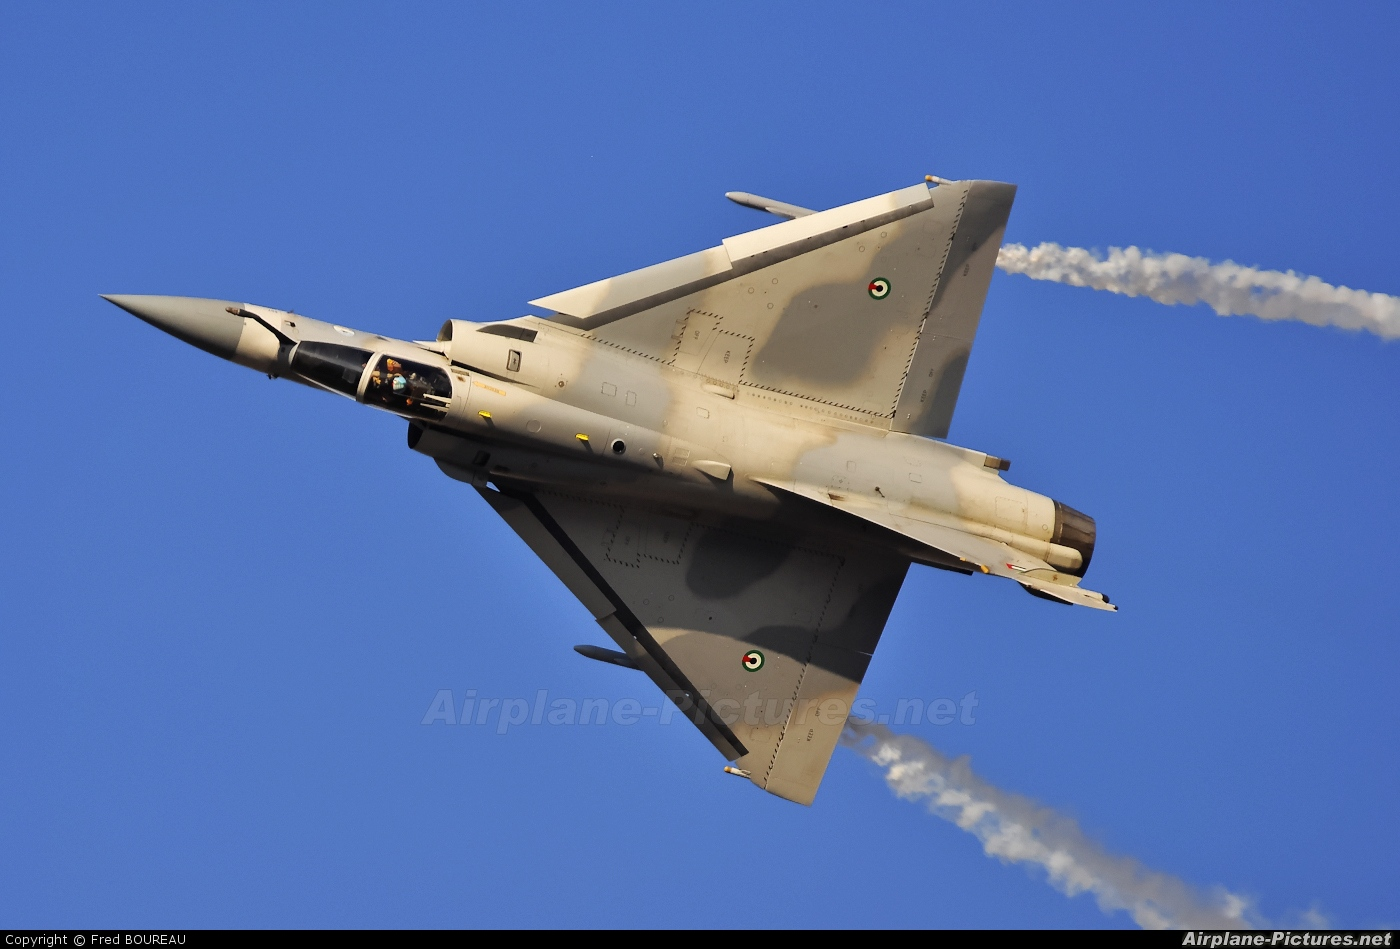 United Arab Emirates - Air Force 740 aircraft at Dubai Intl